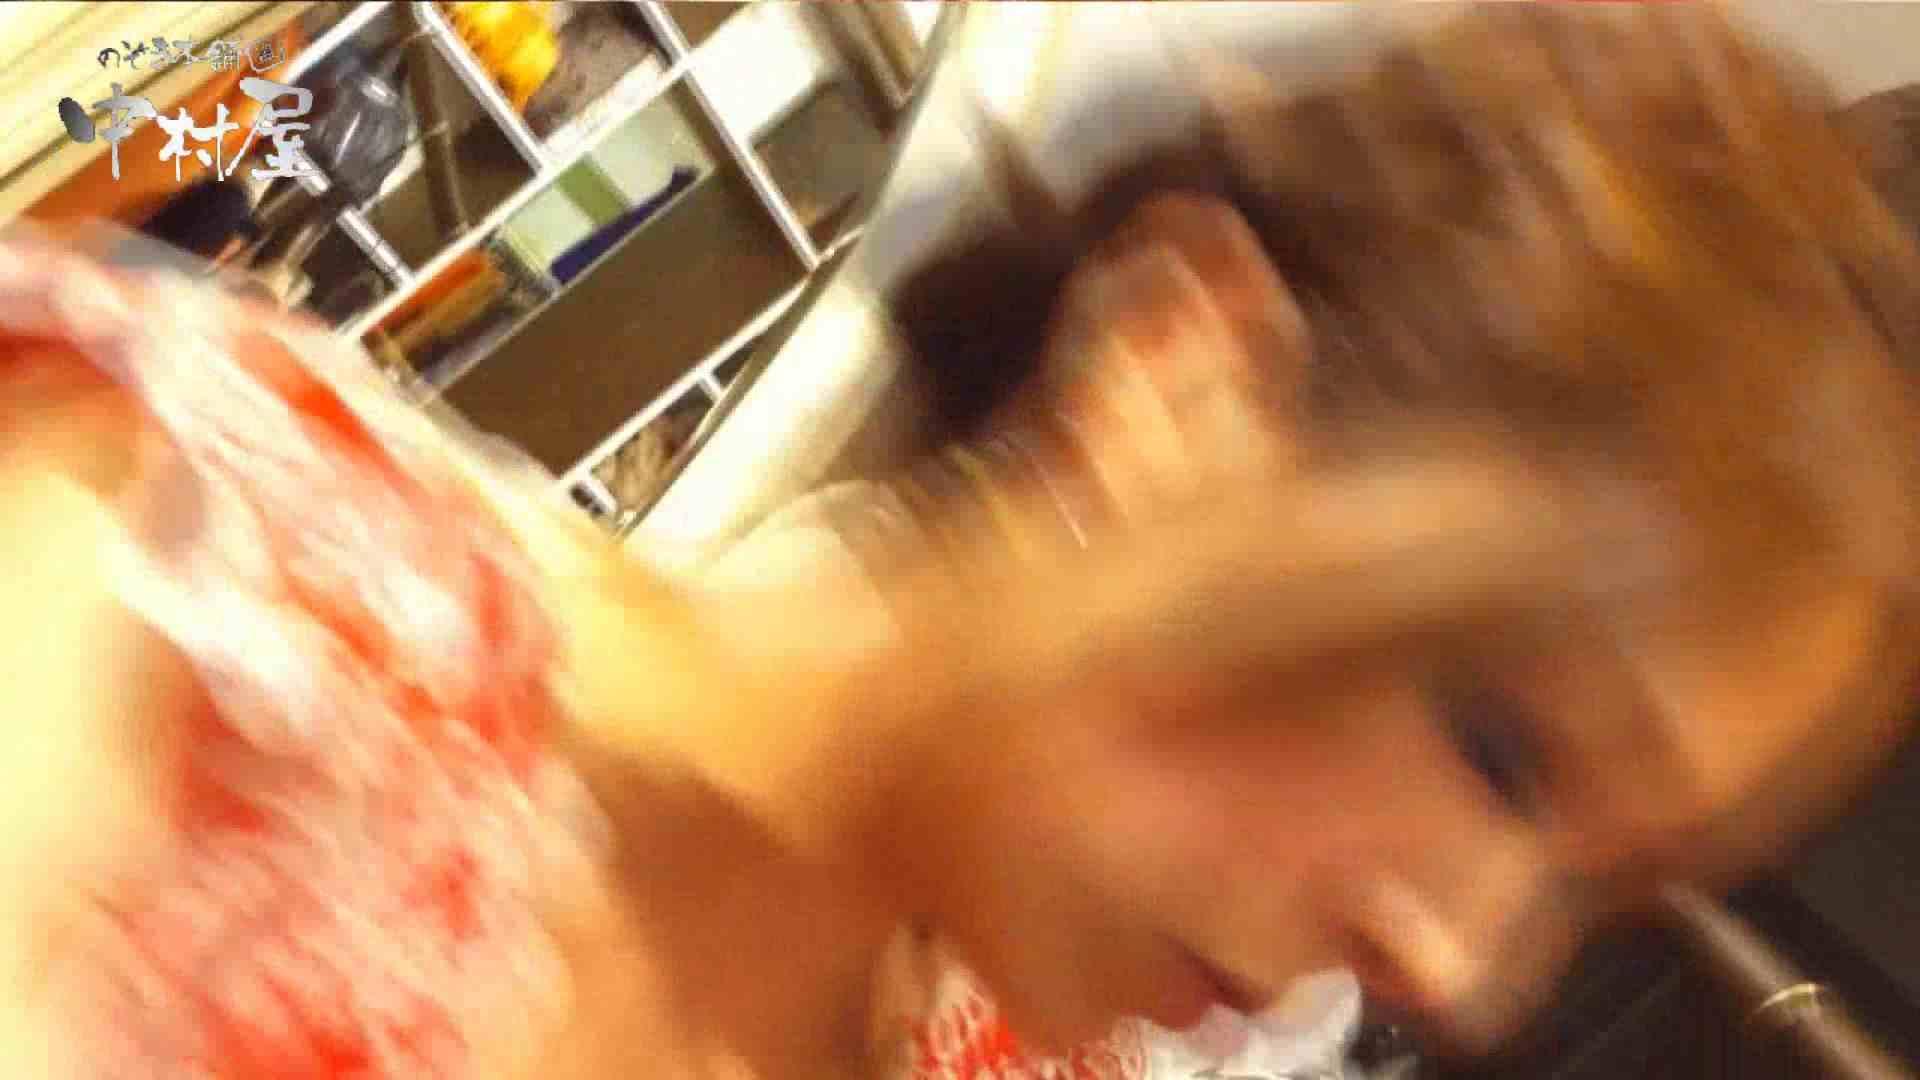 vol.43 可愛いカリスマ店員限定‼胸チラ&パンチラ 美脚おねーさんの胸元ゲット! パンチラ | HなOL  83pic 3